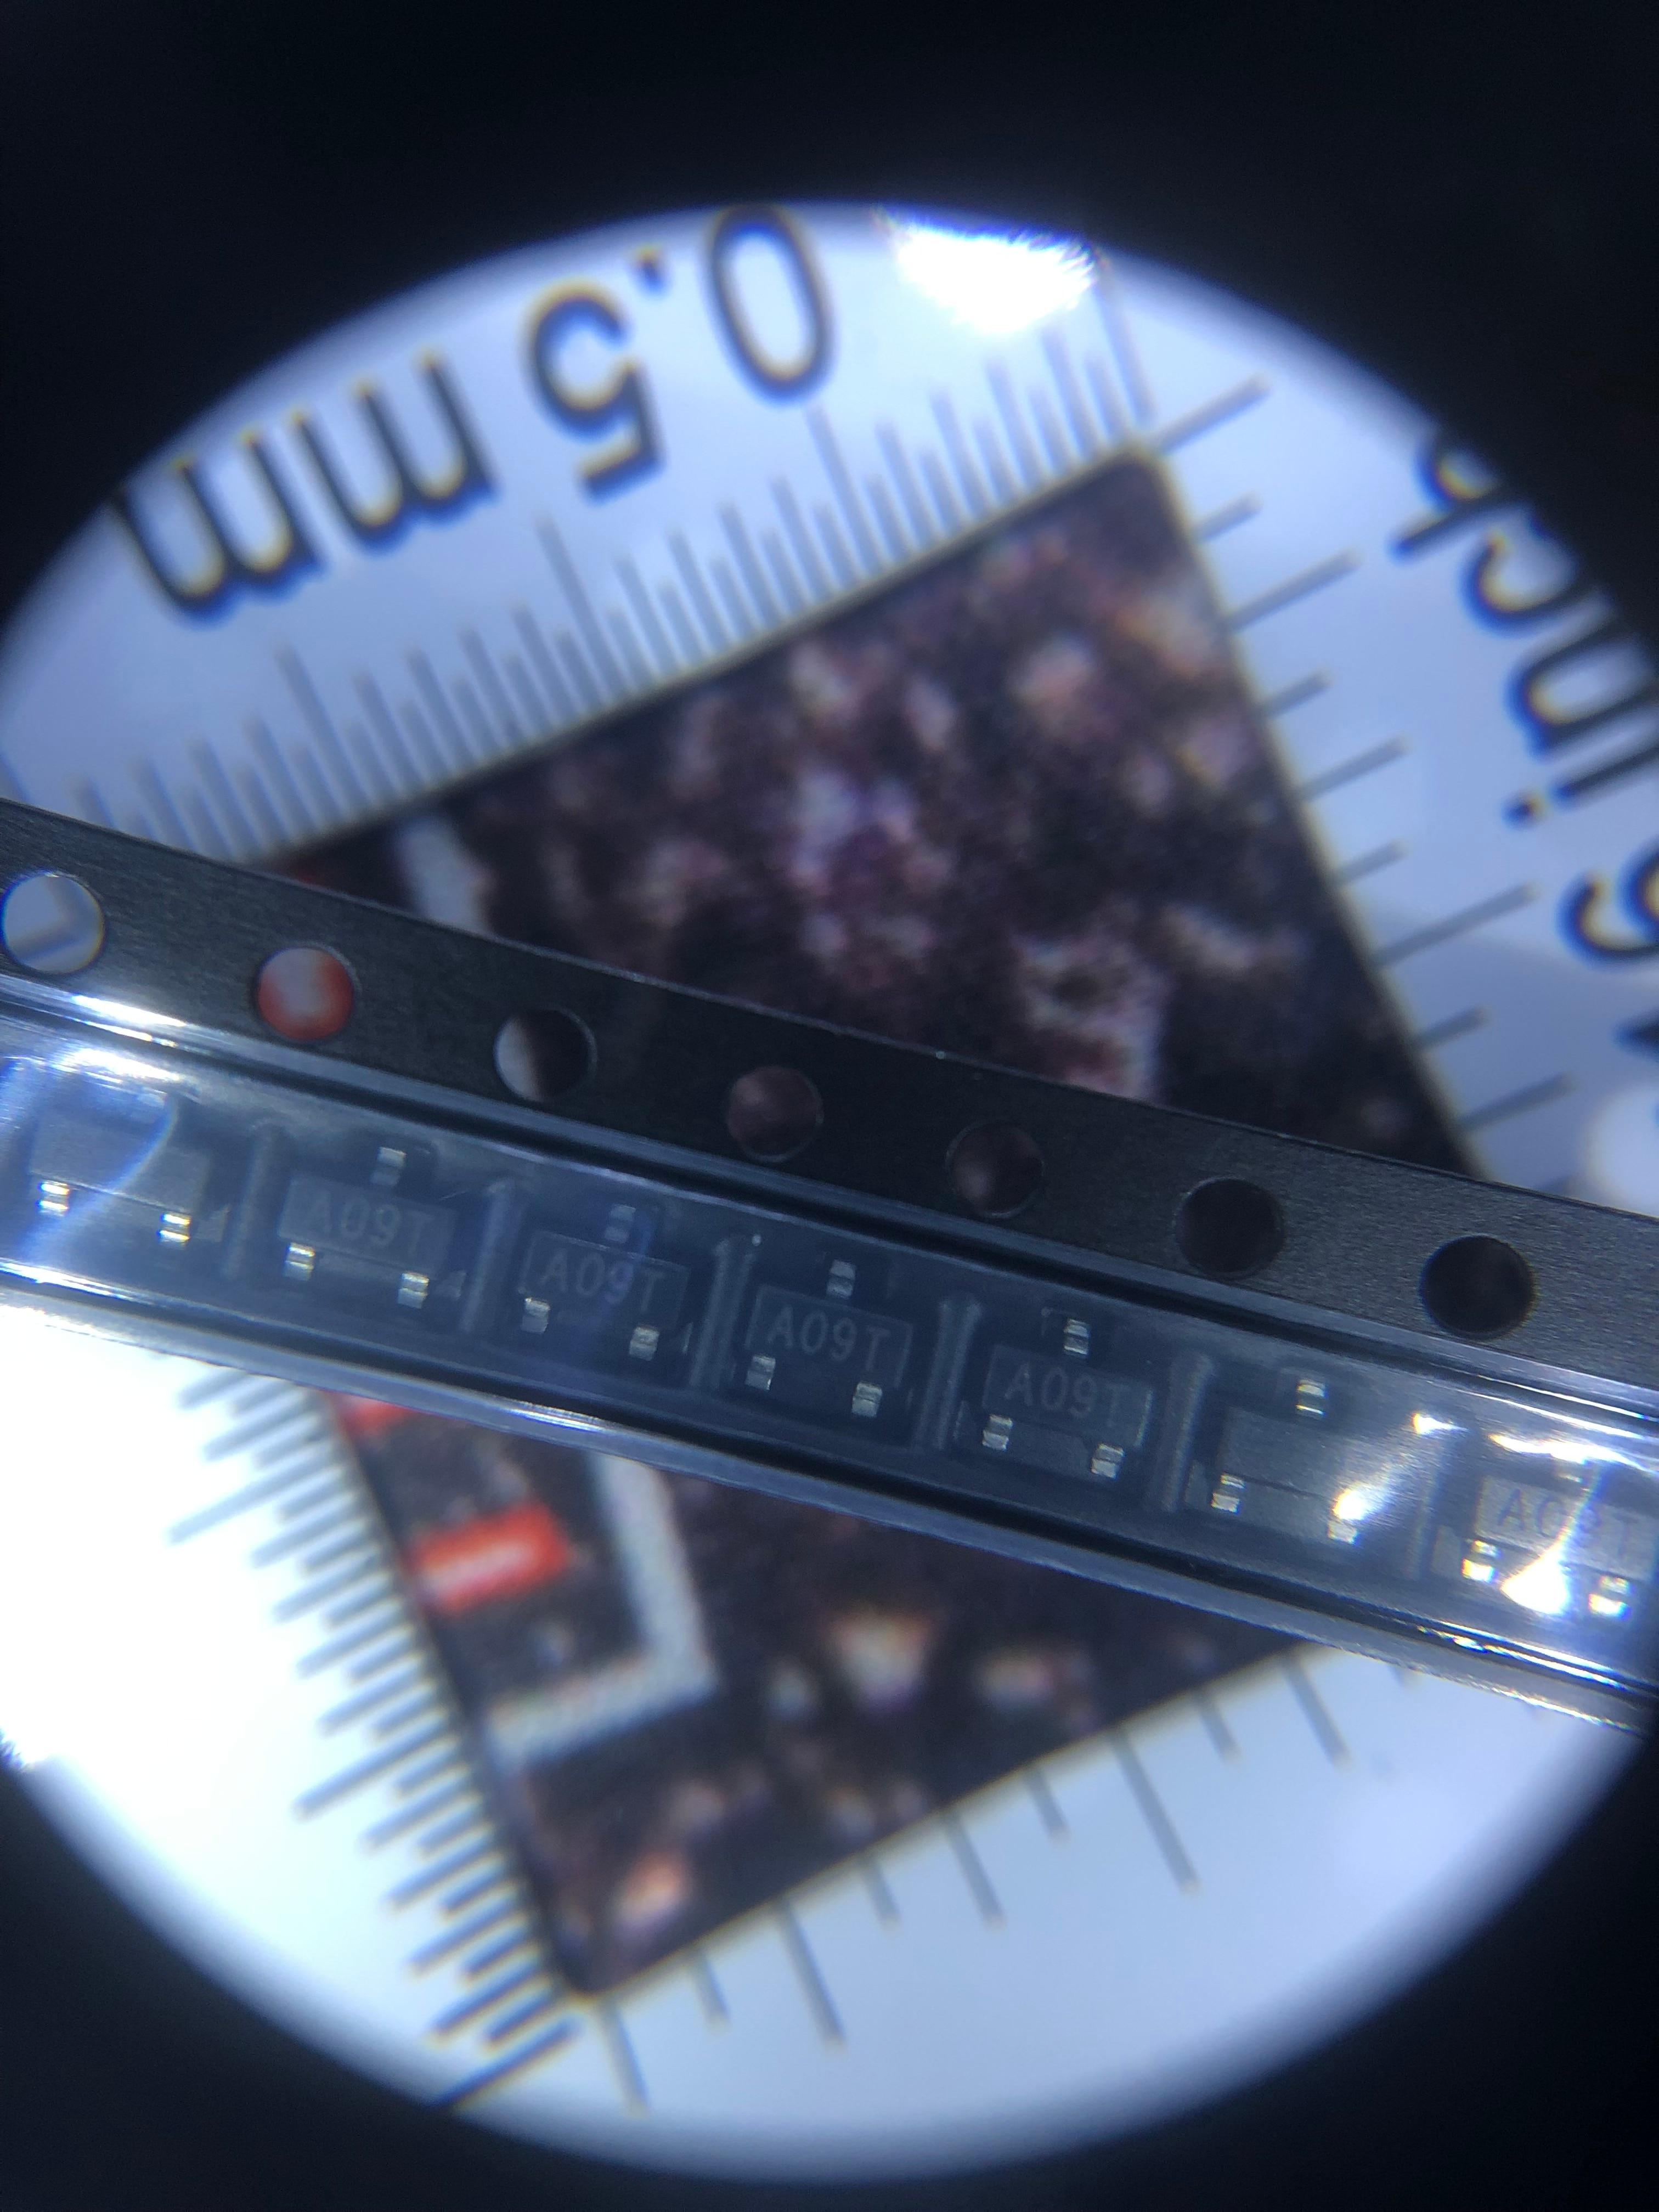 50PCS/100PCS AO3400 SOT23 AO3400A SOT-23 A09T SOT new MOS FET transistor